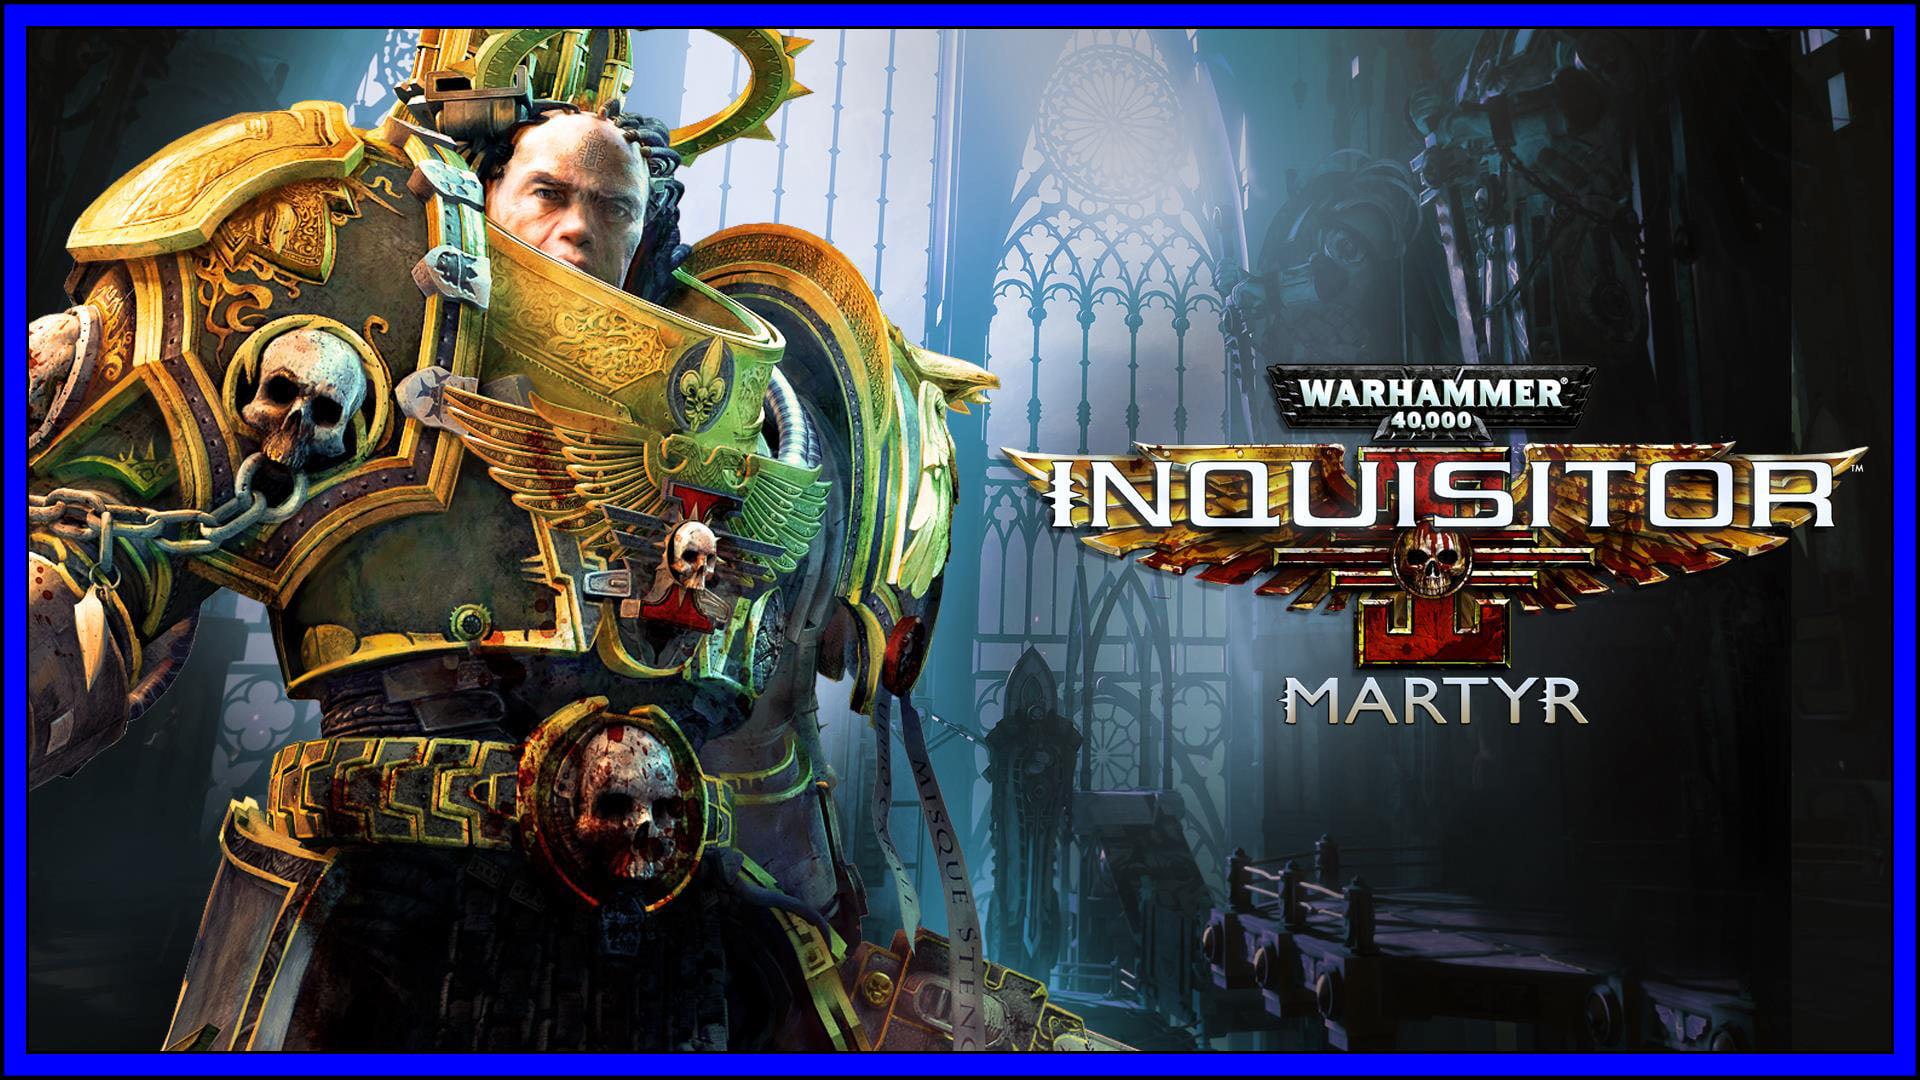 Warhammer Inquisitor Fi3